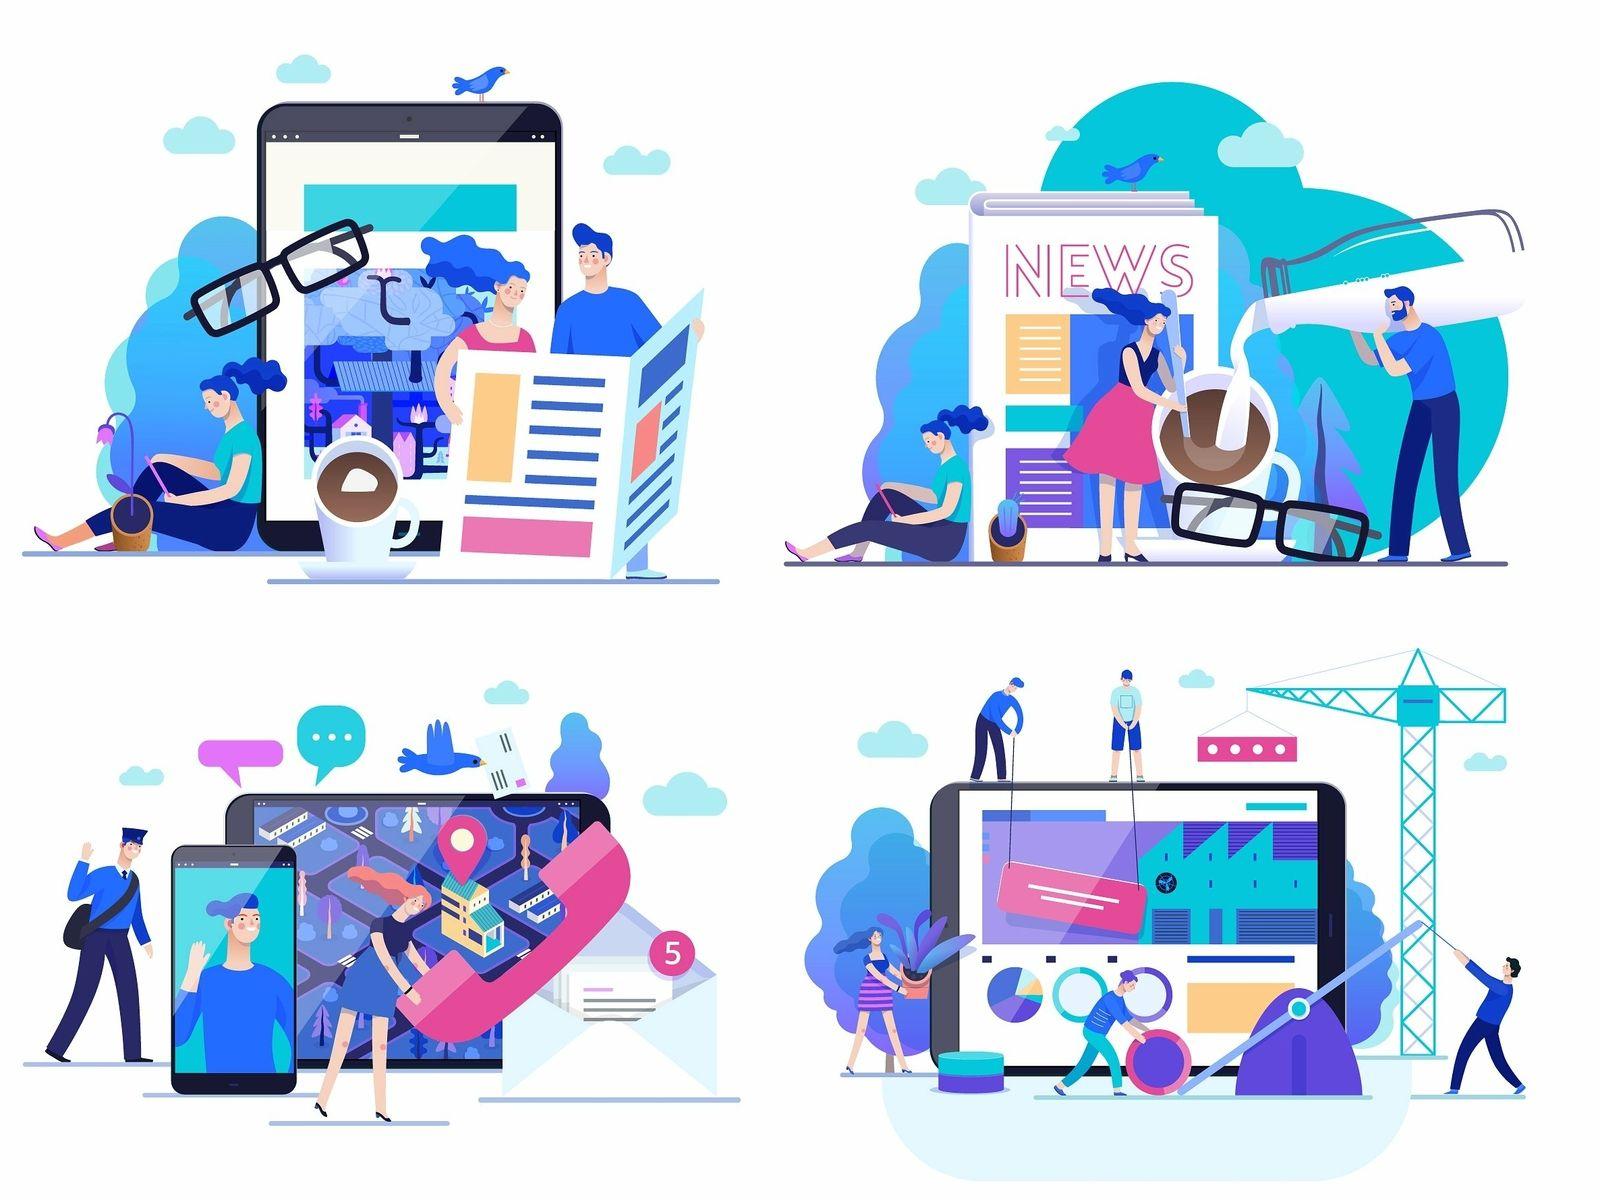 Company Website Vector Illustrations Website Illustration Vector Illustration Vector Illustration Design